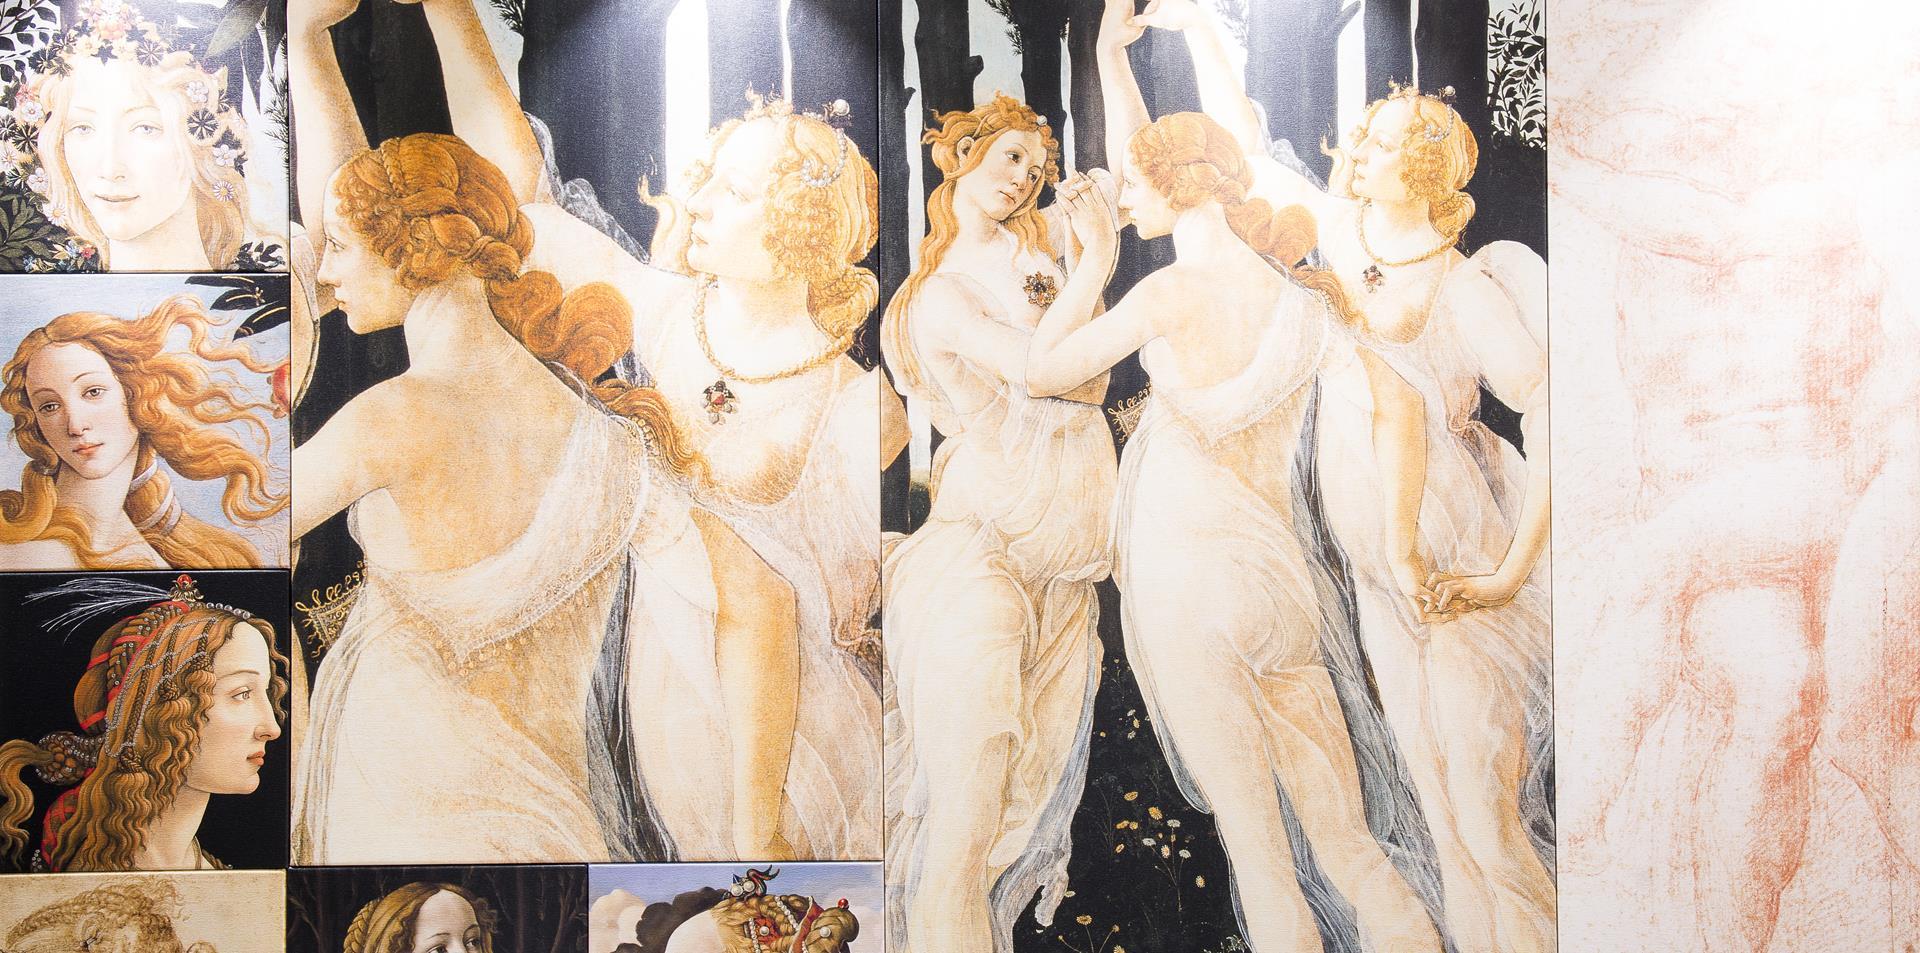 Cristal Spa Annecy peinture